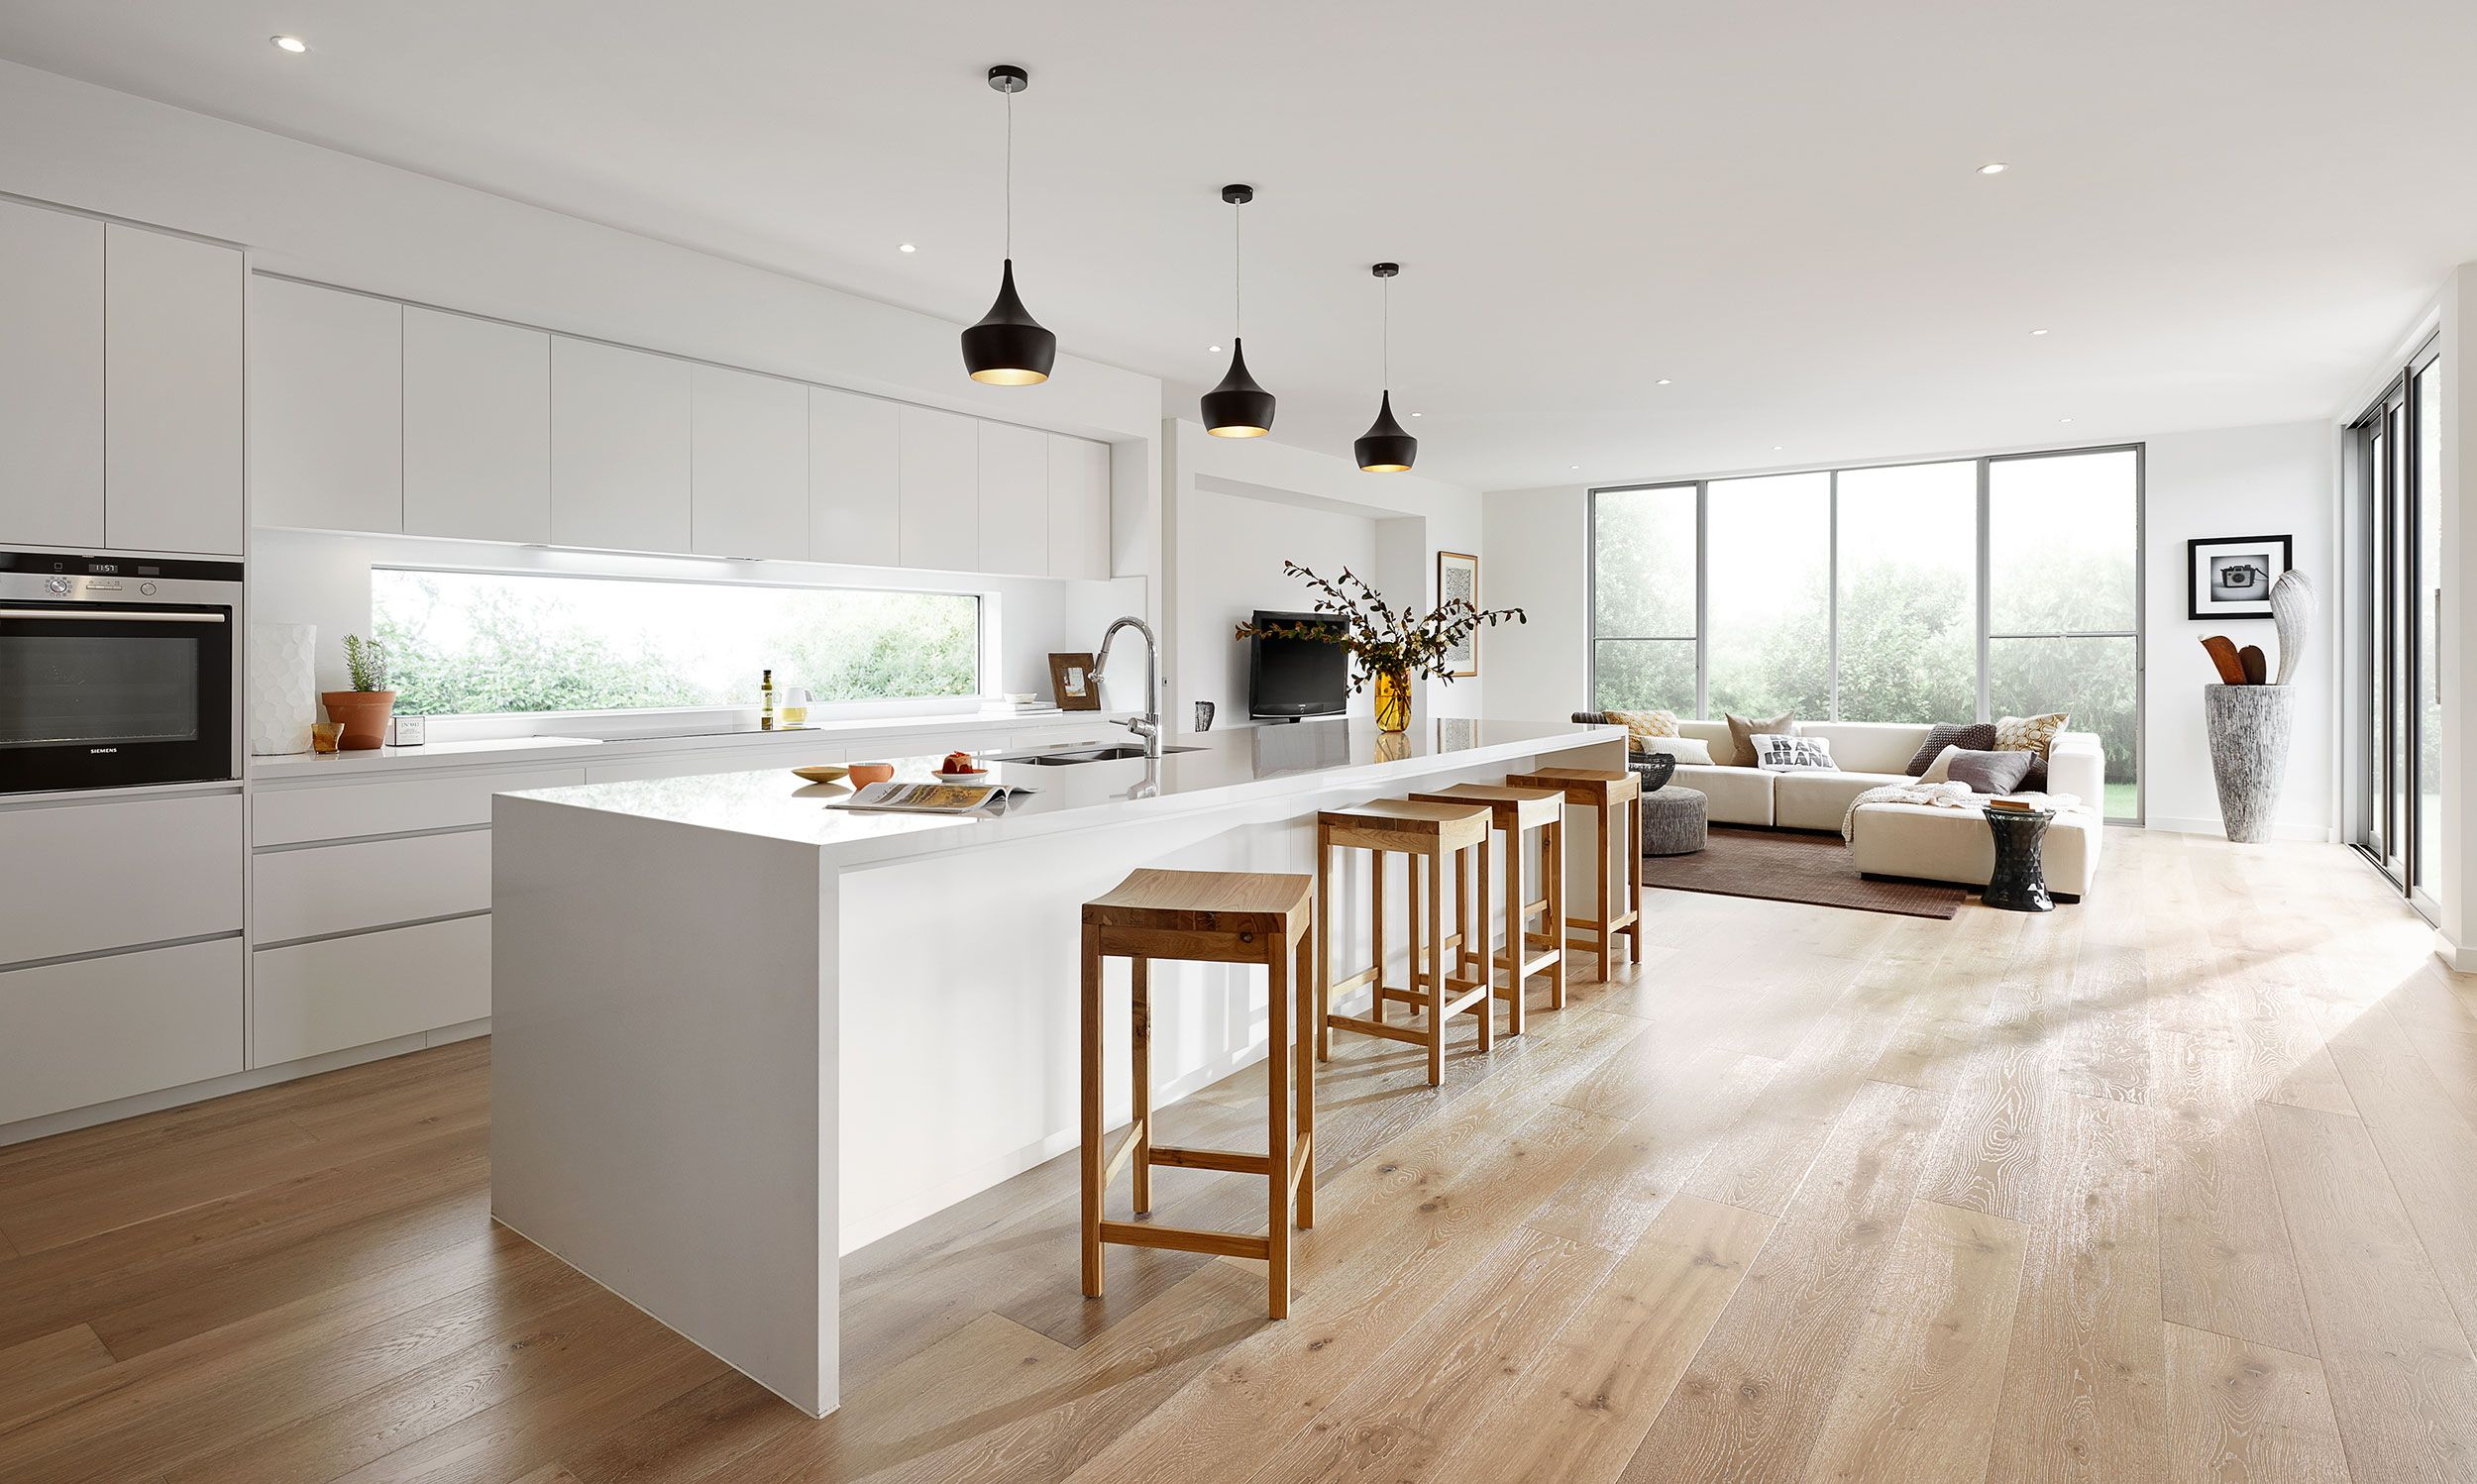 Caulfield 50 kitchen and family. Kitchen inspiration